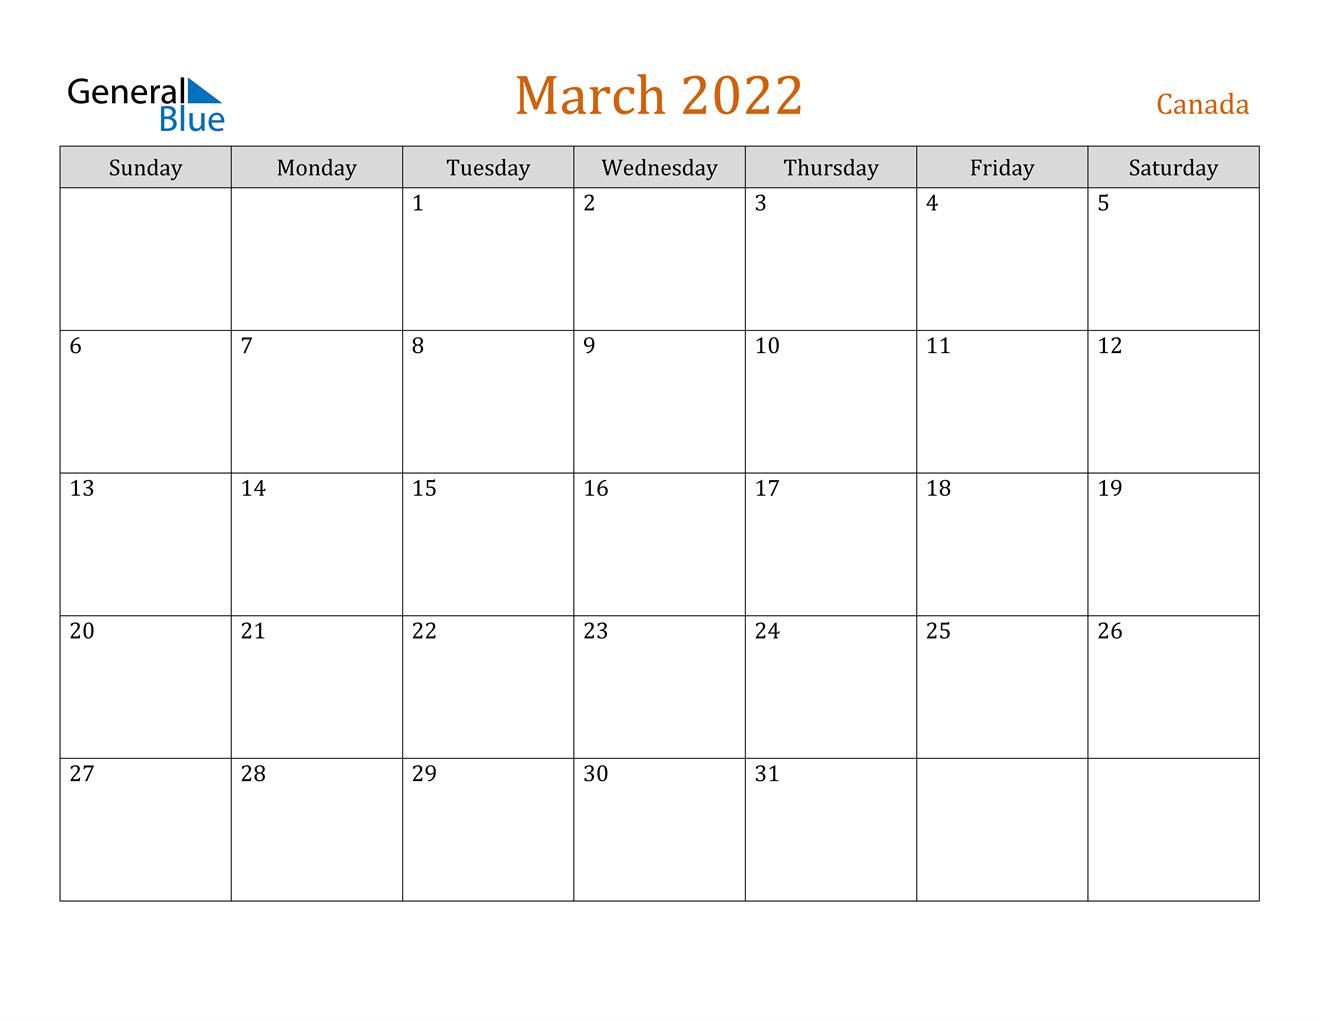 March 2022 Calendar - Canada